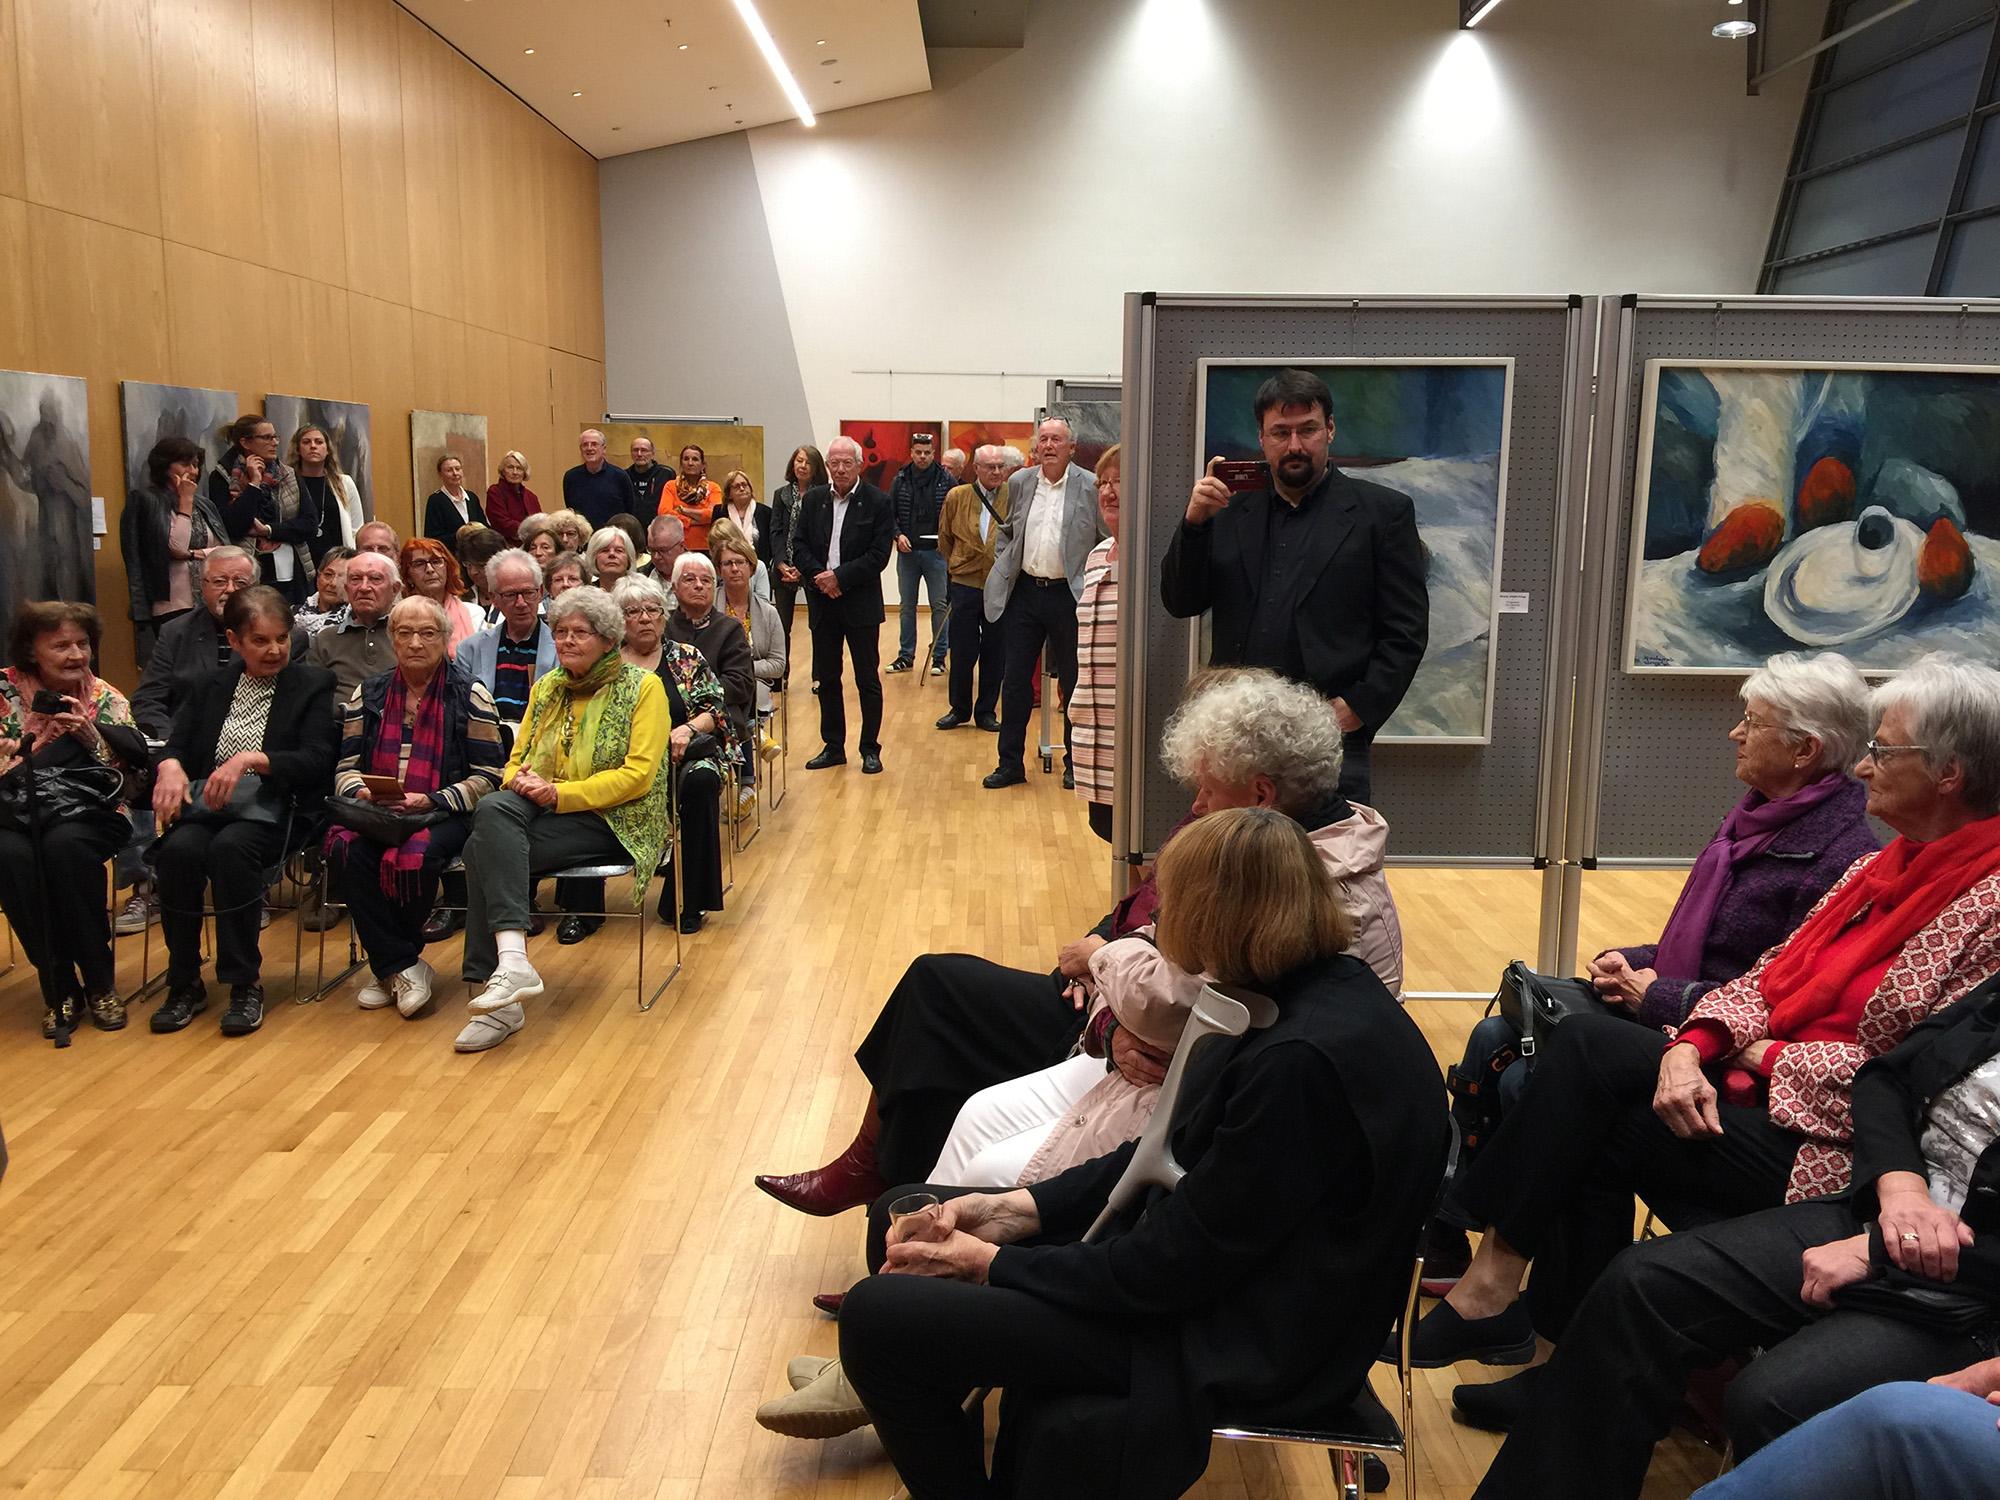 Künstlerin Constanze Wagner: Rerospektive in der Stadthalle Germering